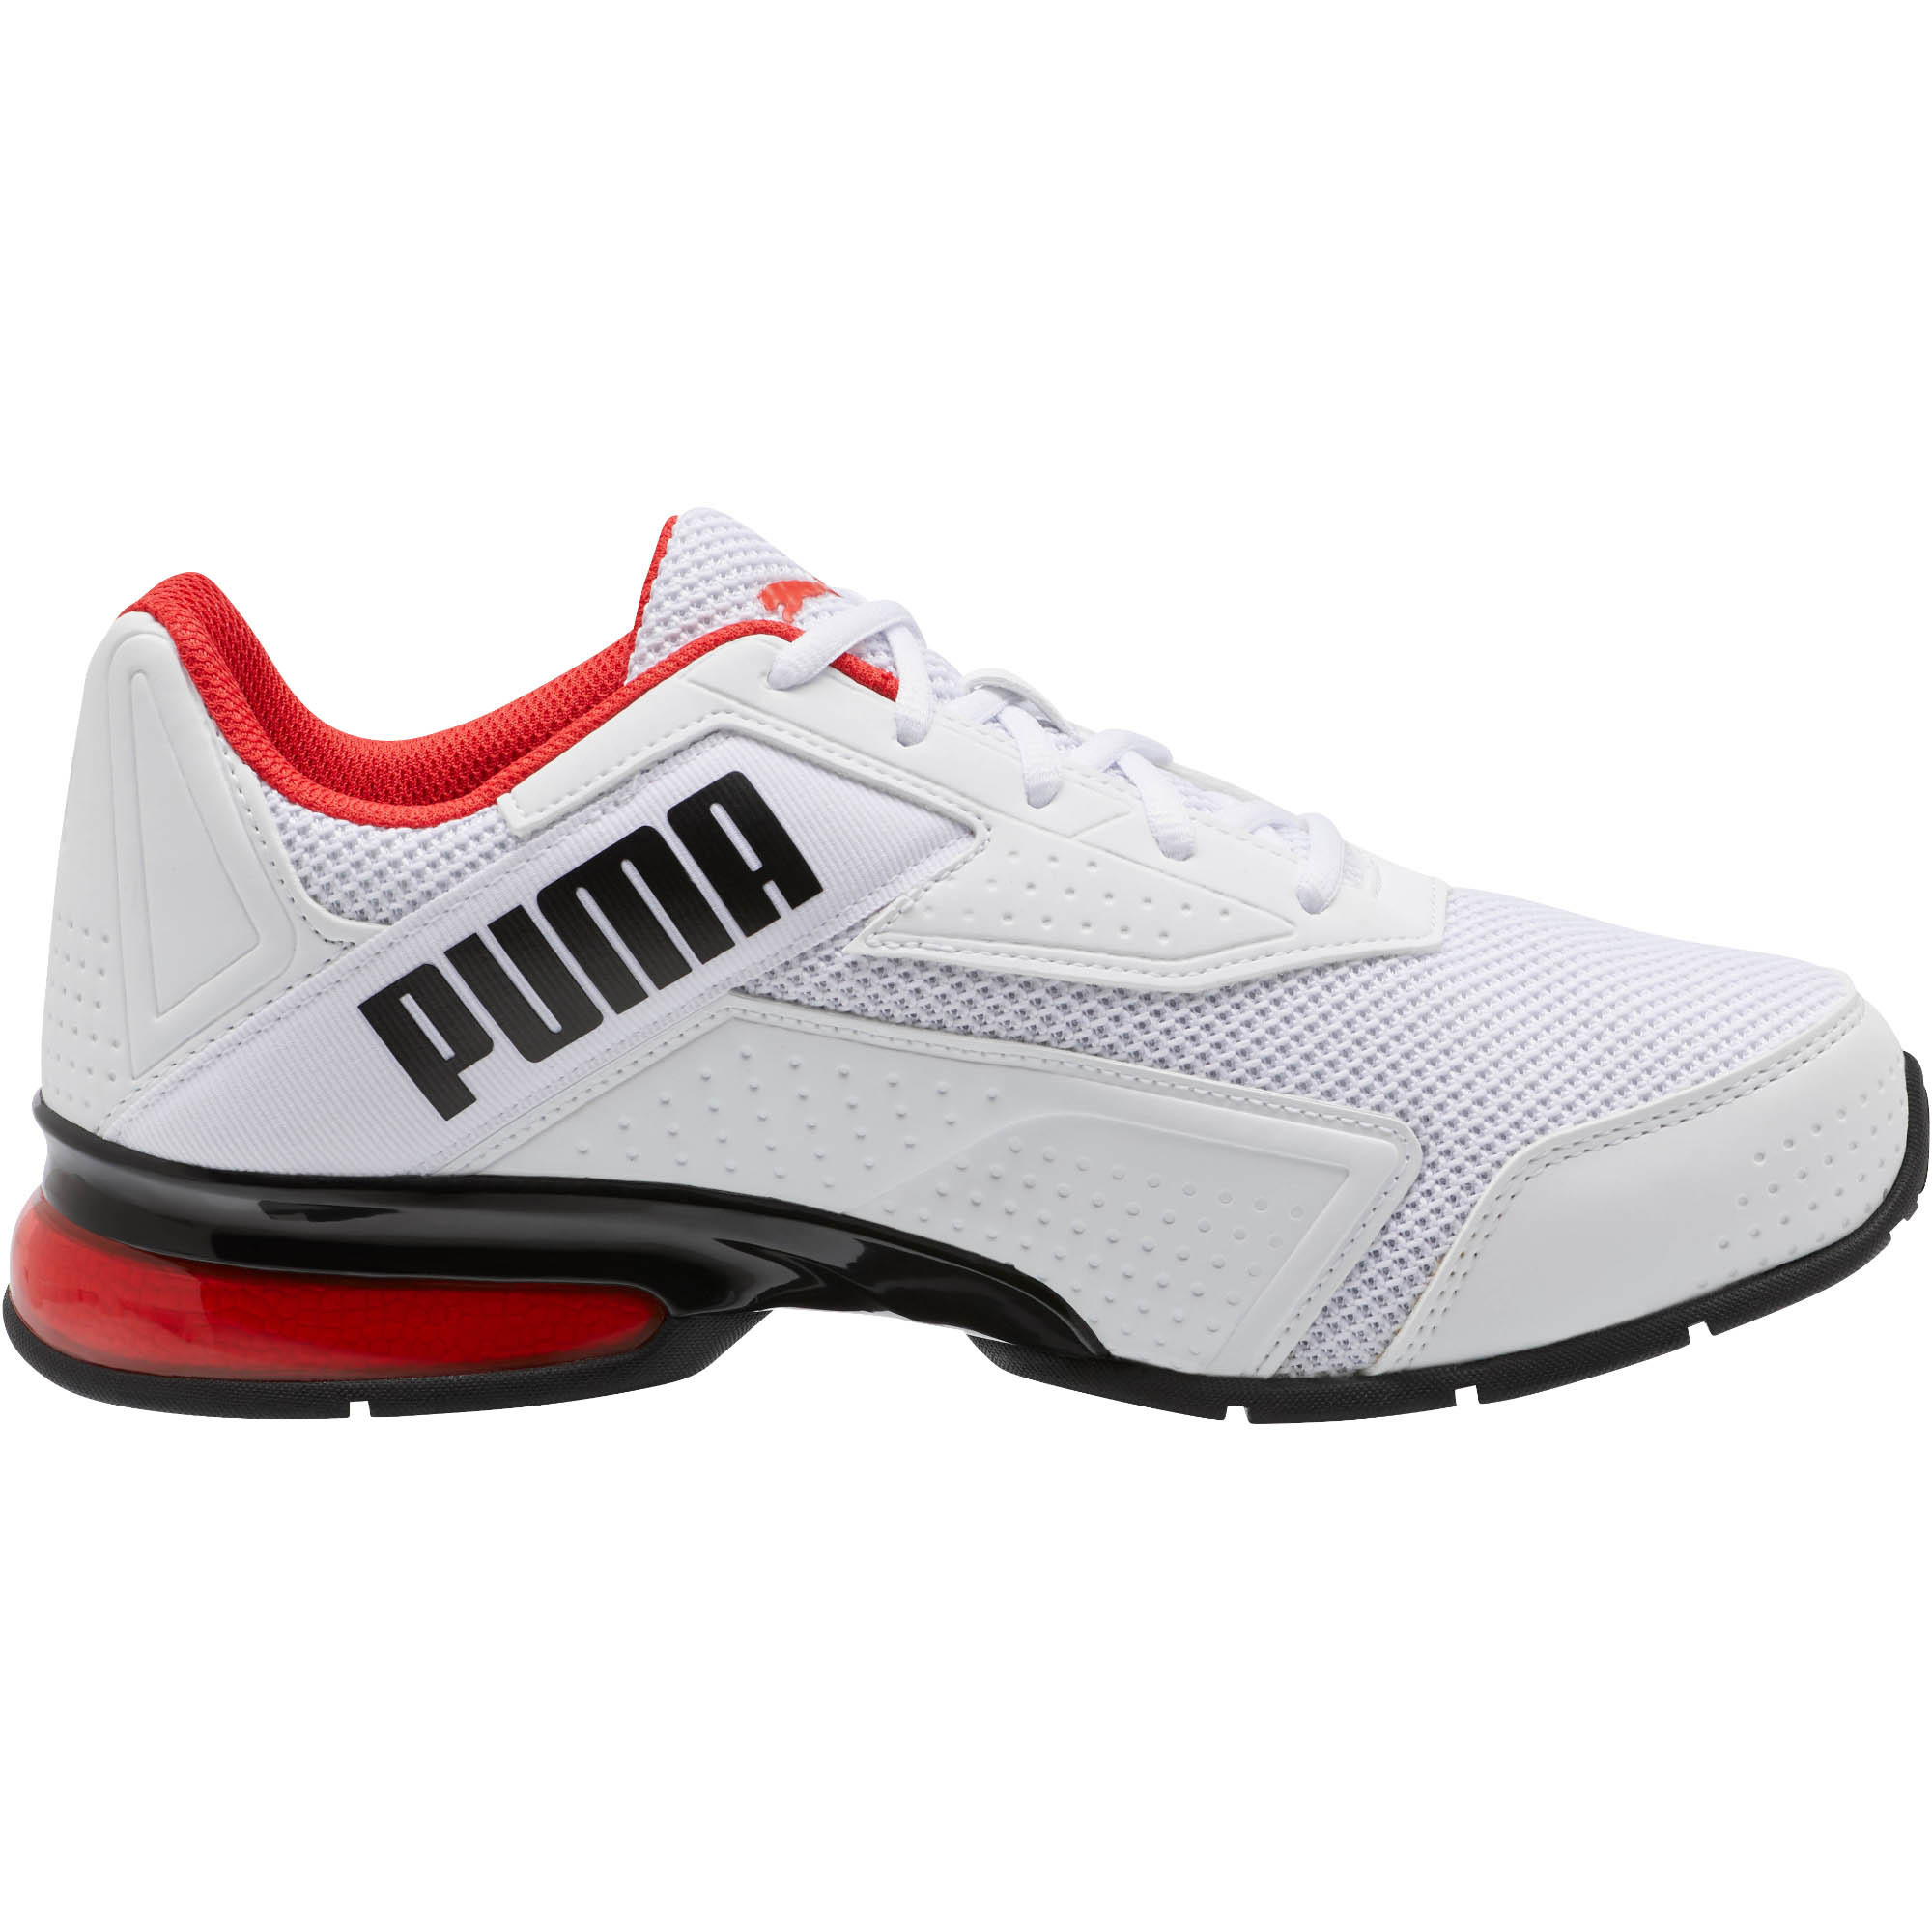 PUMA-Leader-VT-Bold-Men-039-s-Training-Shoes-Men-Shoe-Running thumbnail 5